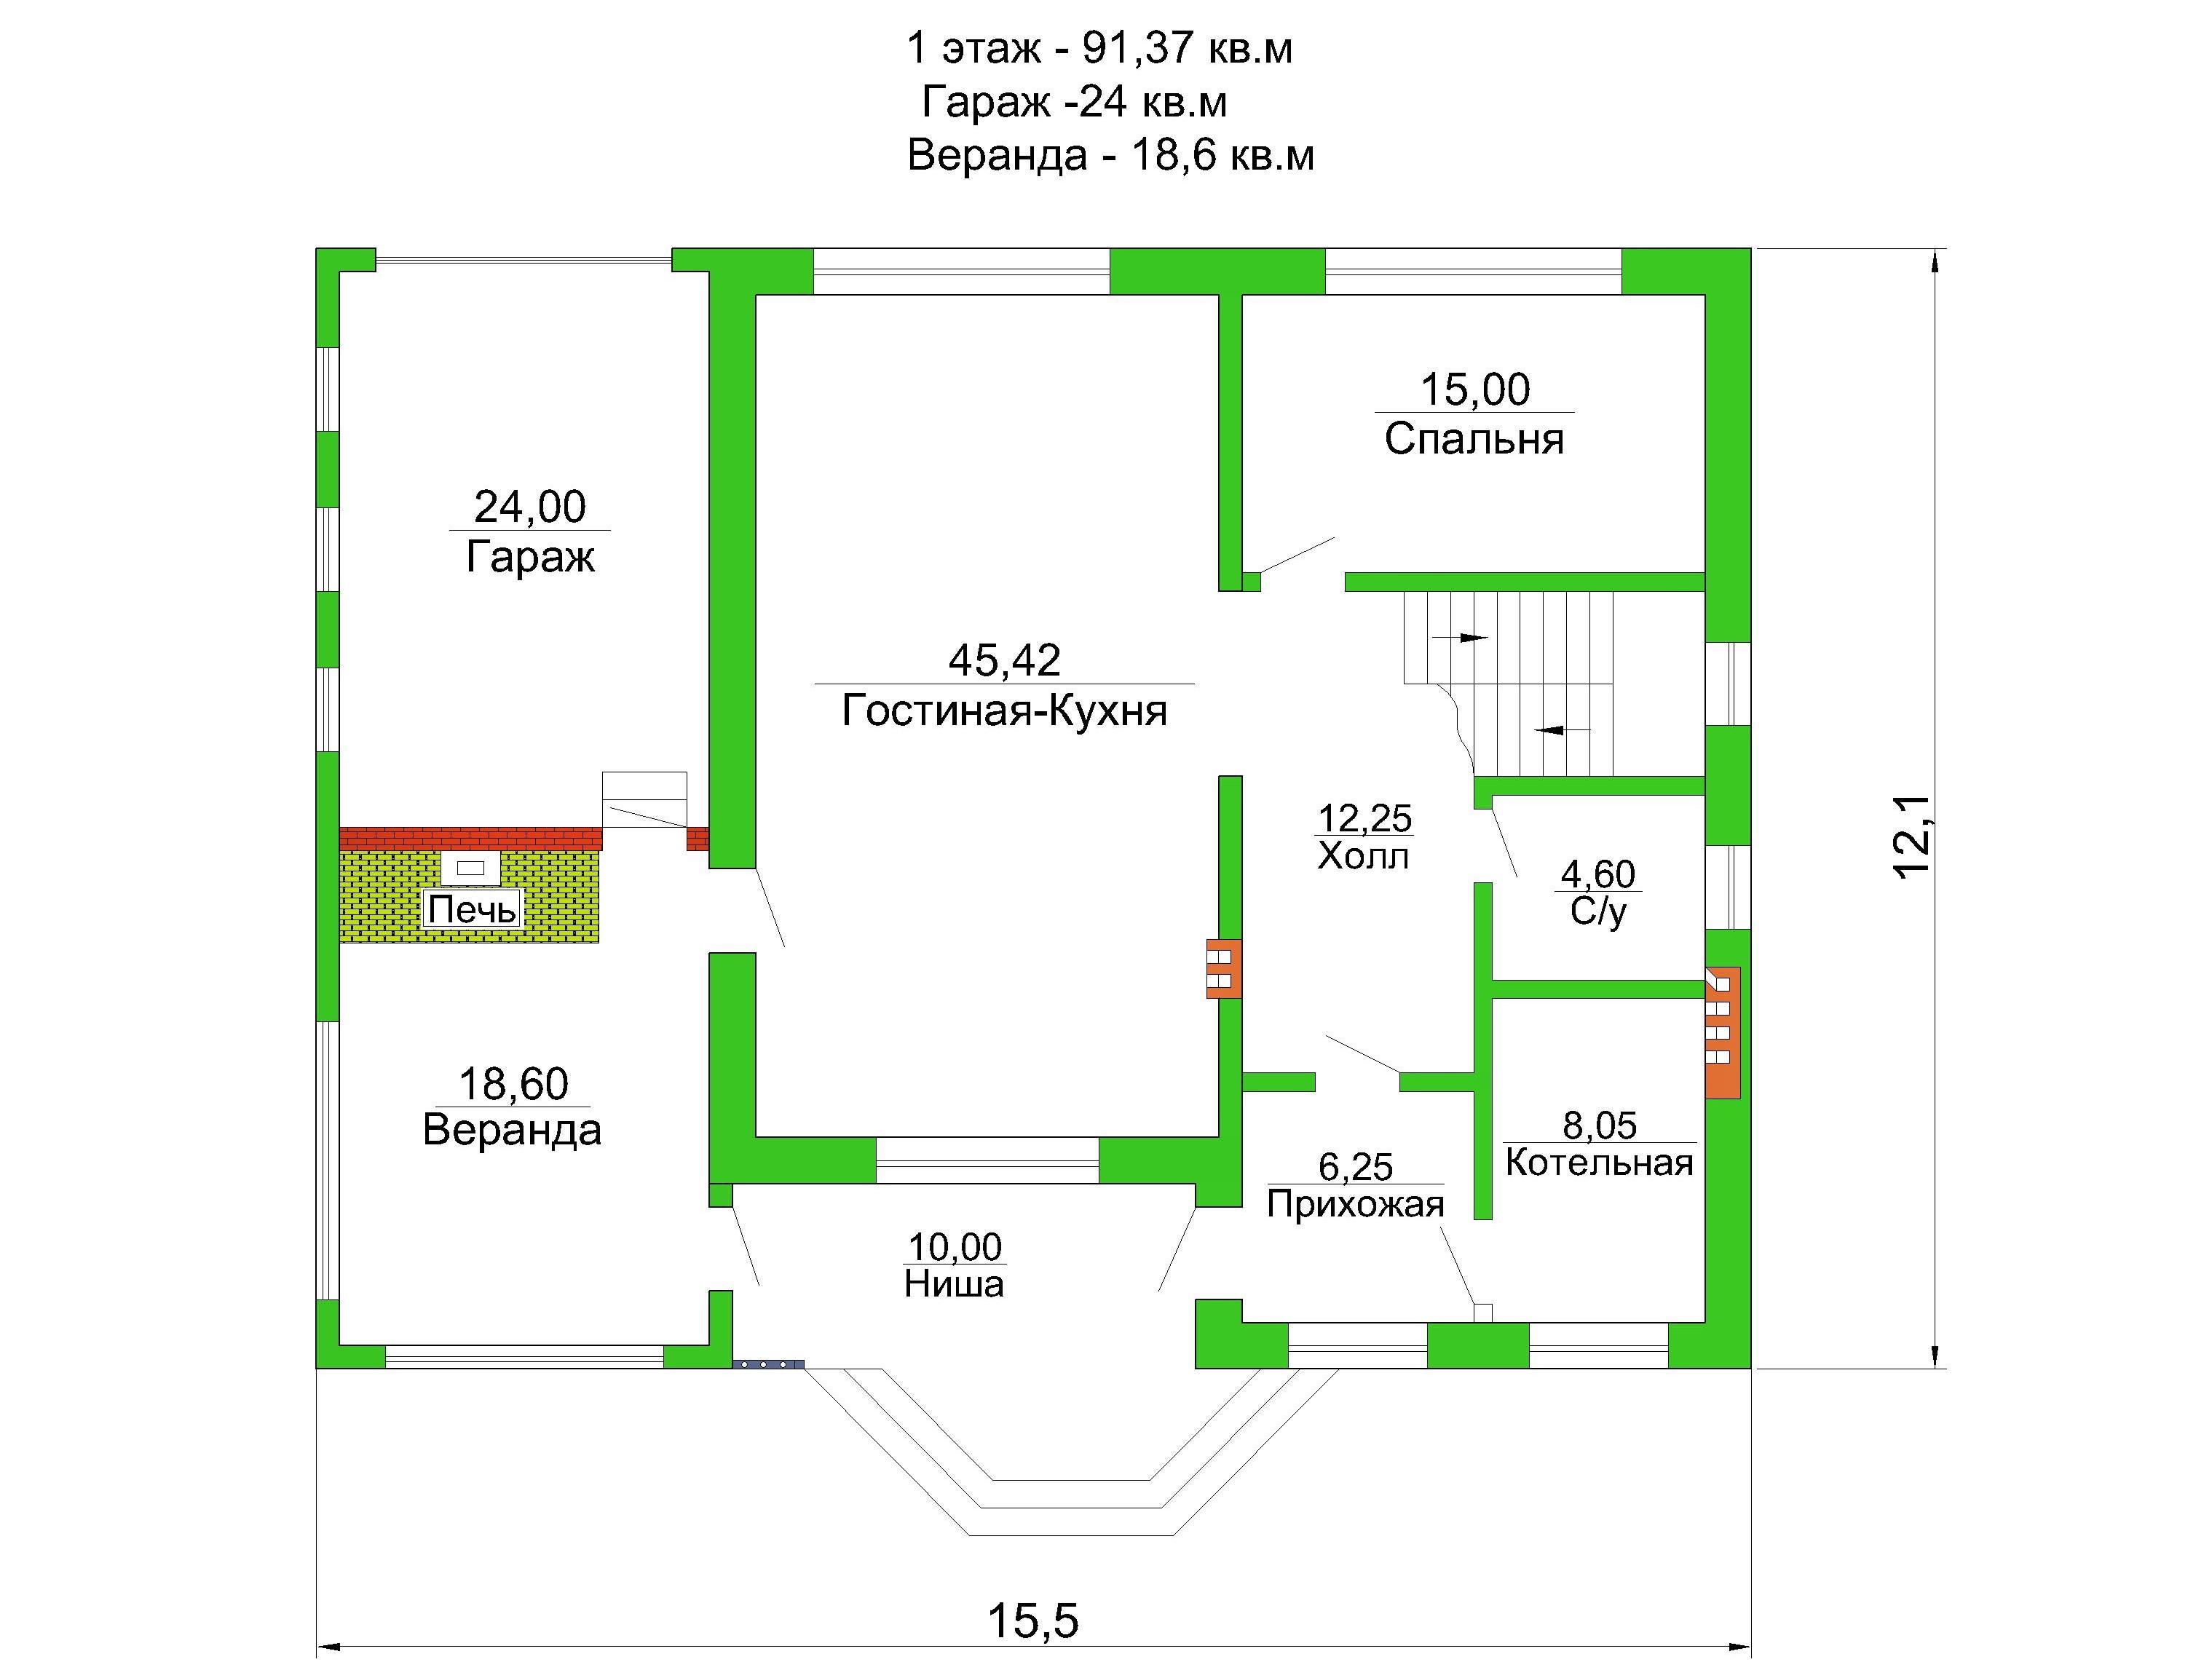 Готовый проект коттеджа 168 кв. м / Артикул АГ-227 план